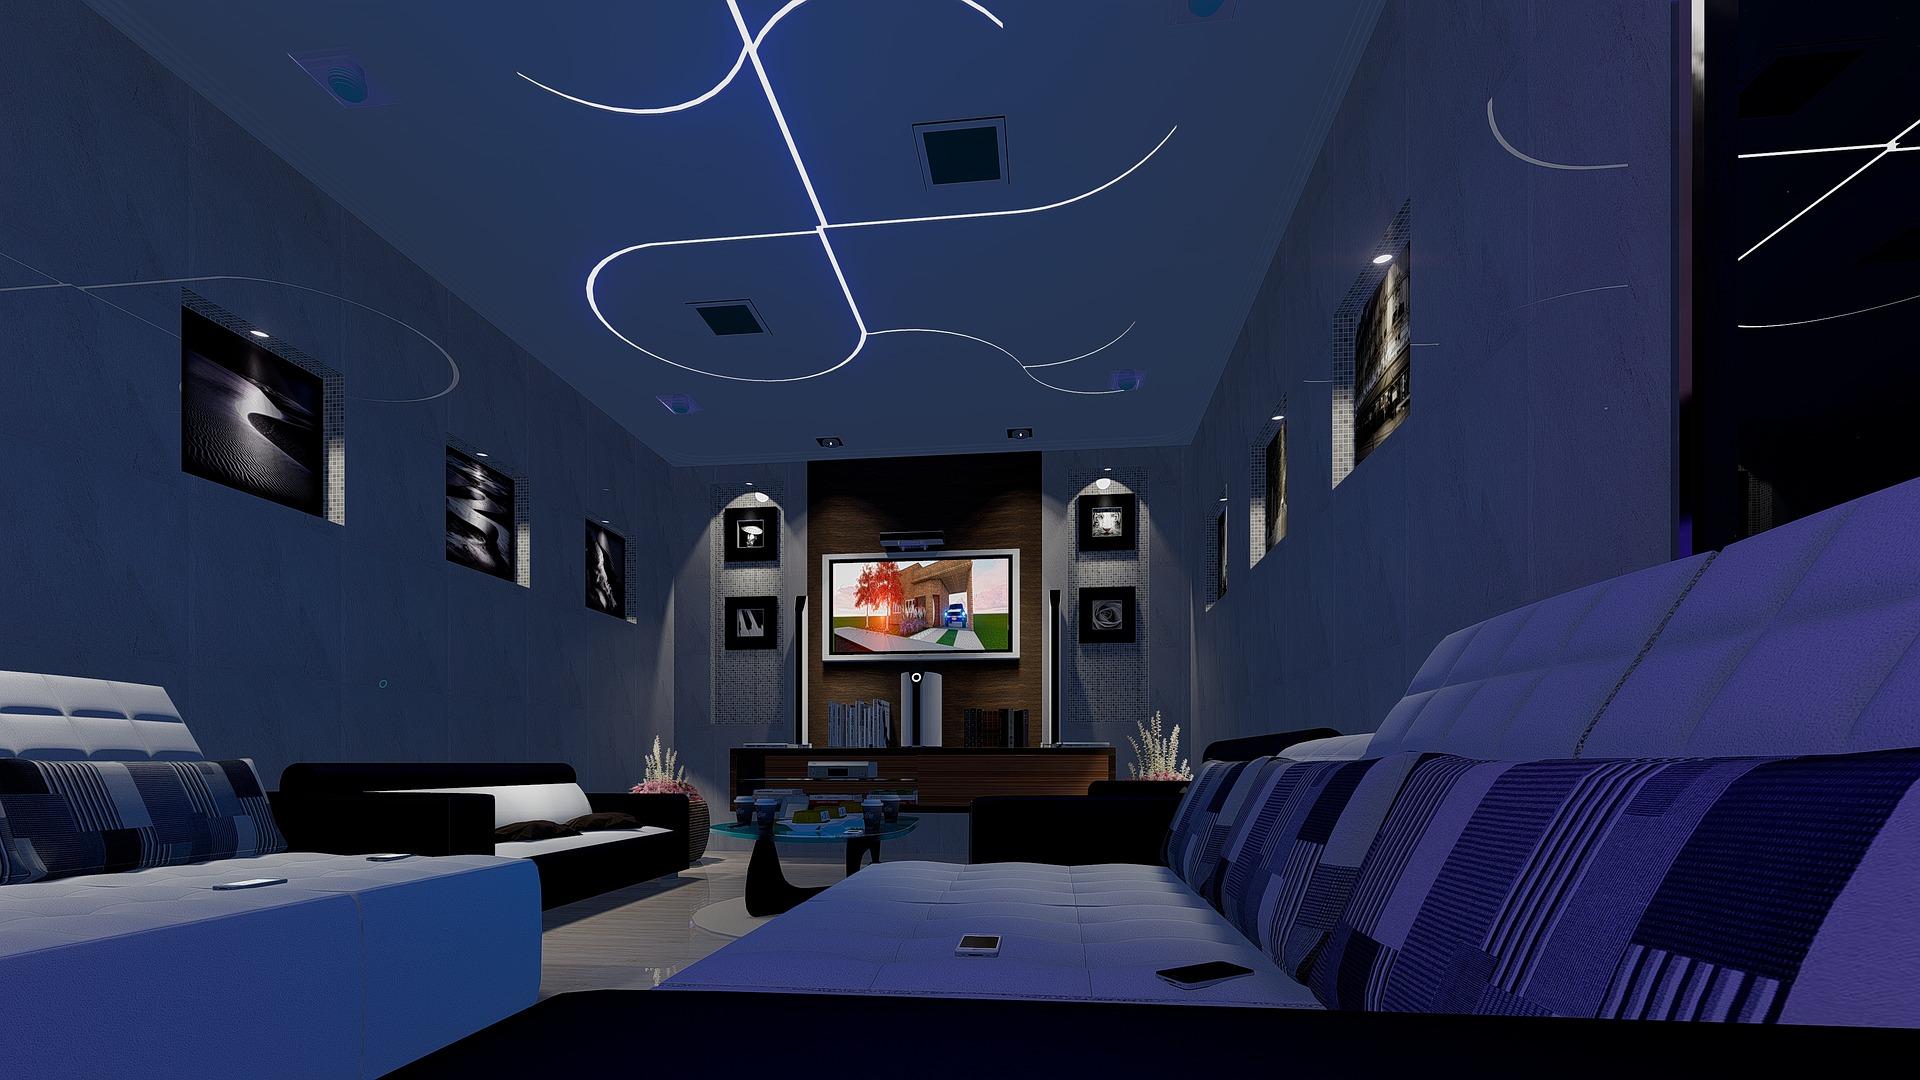 LED plafond